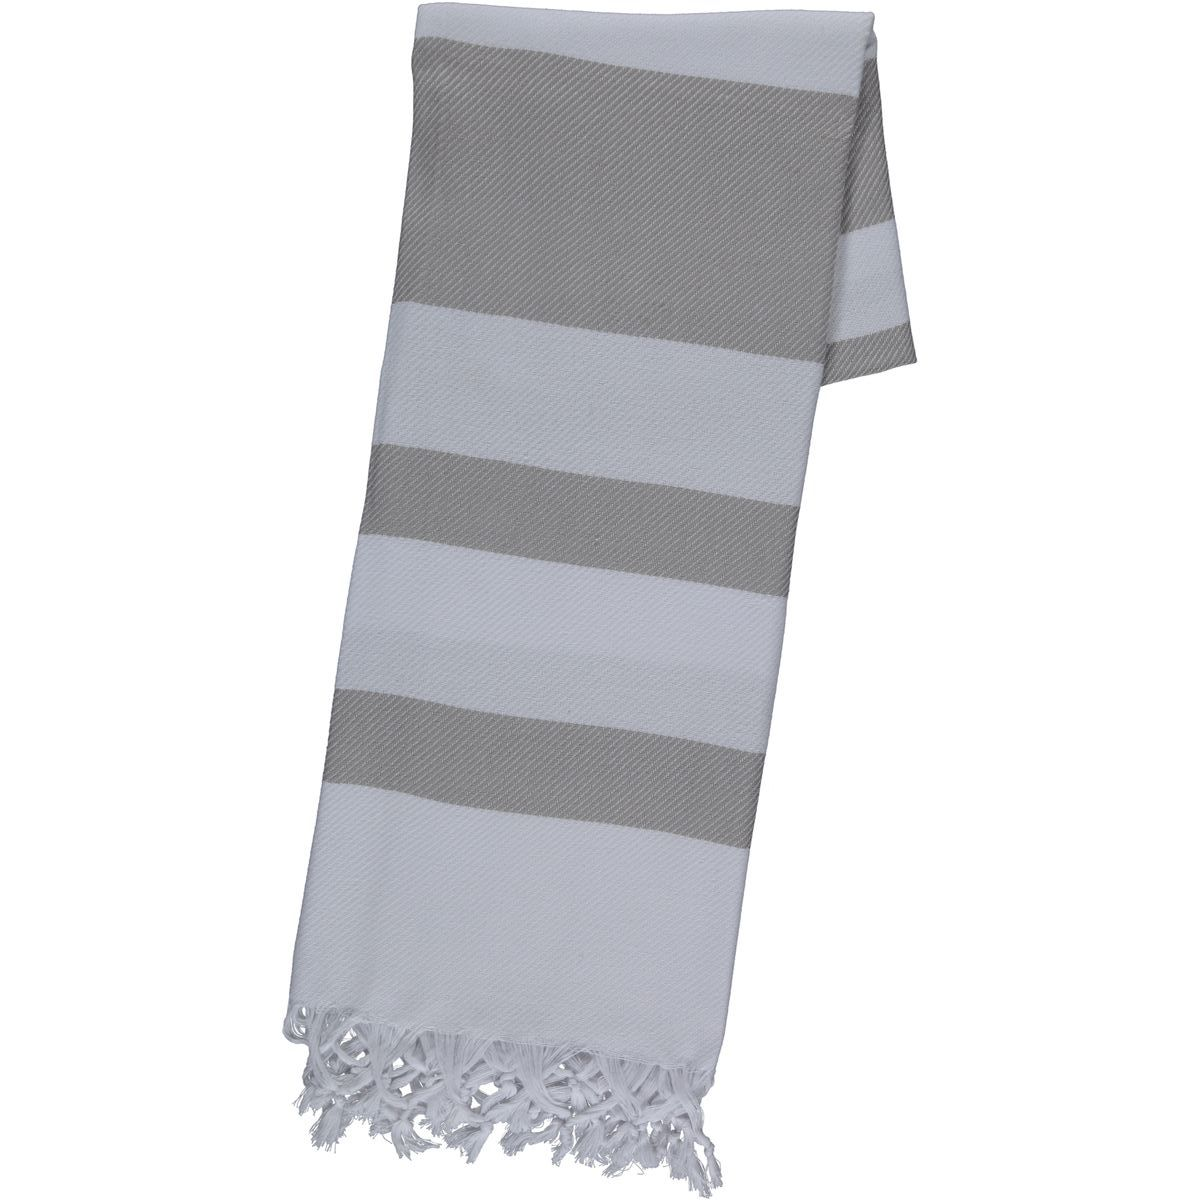 Peshtemal / Towel Soho - White / Taupe